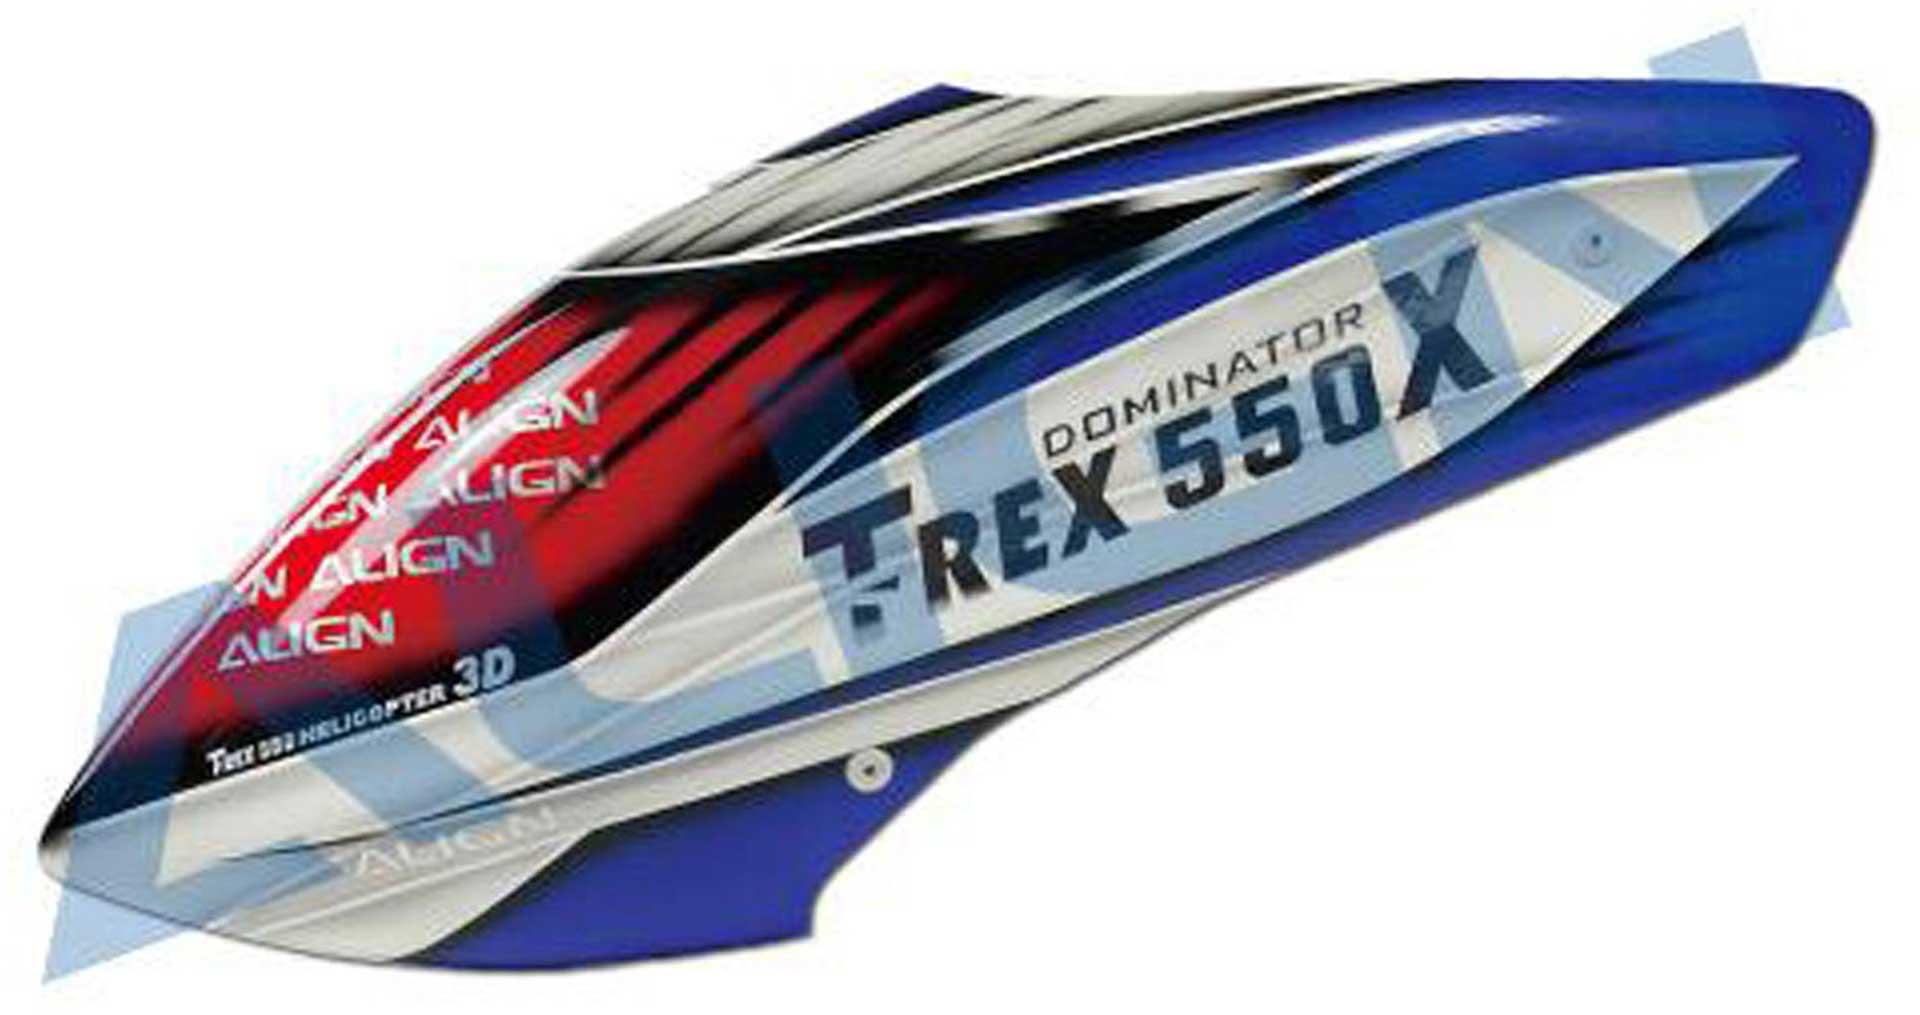 ALIGN 550X Kabinenhaube, lackiert